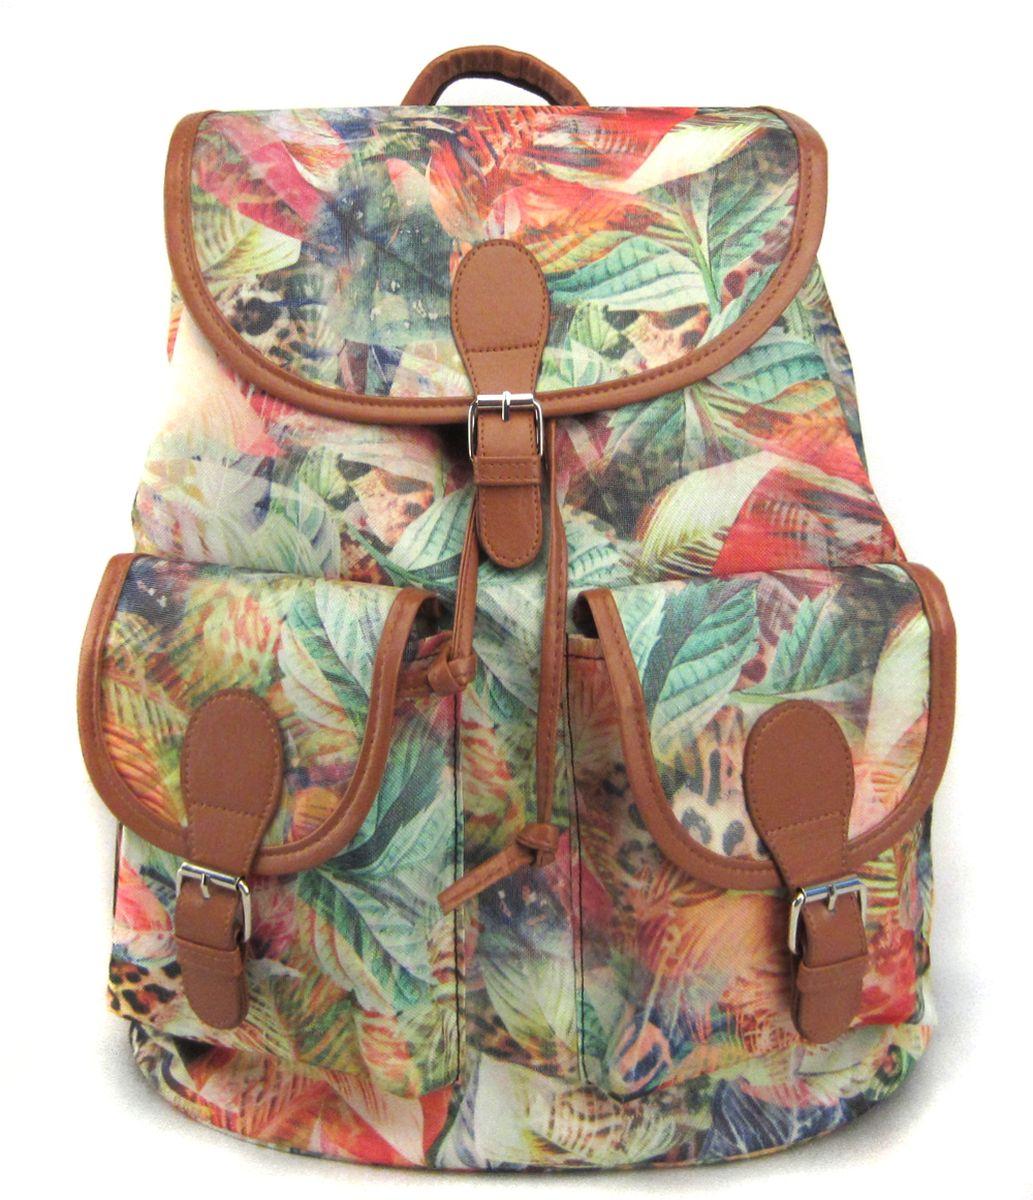 Рюкзак молодежный Creative Флора лета, цвет: мультиколор, 23 л mojo pax рюкзак sport bascket ball